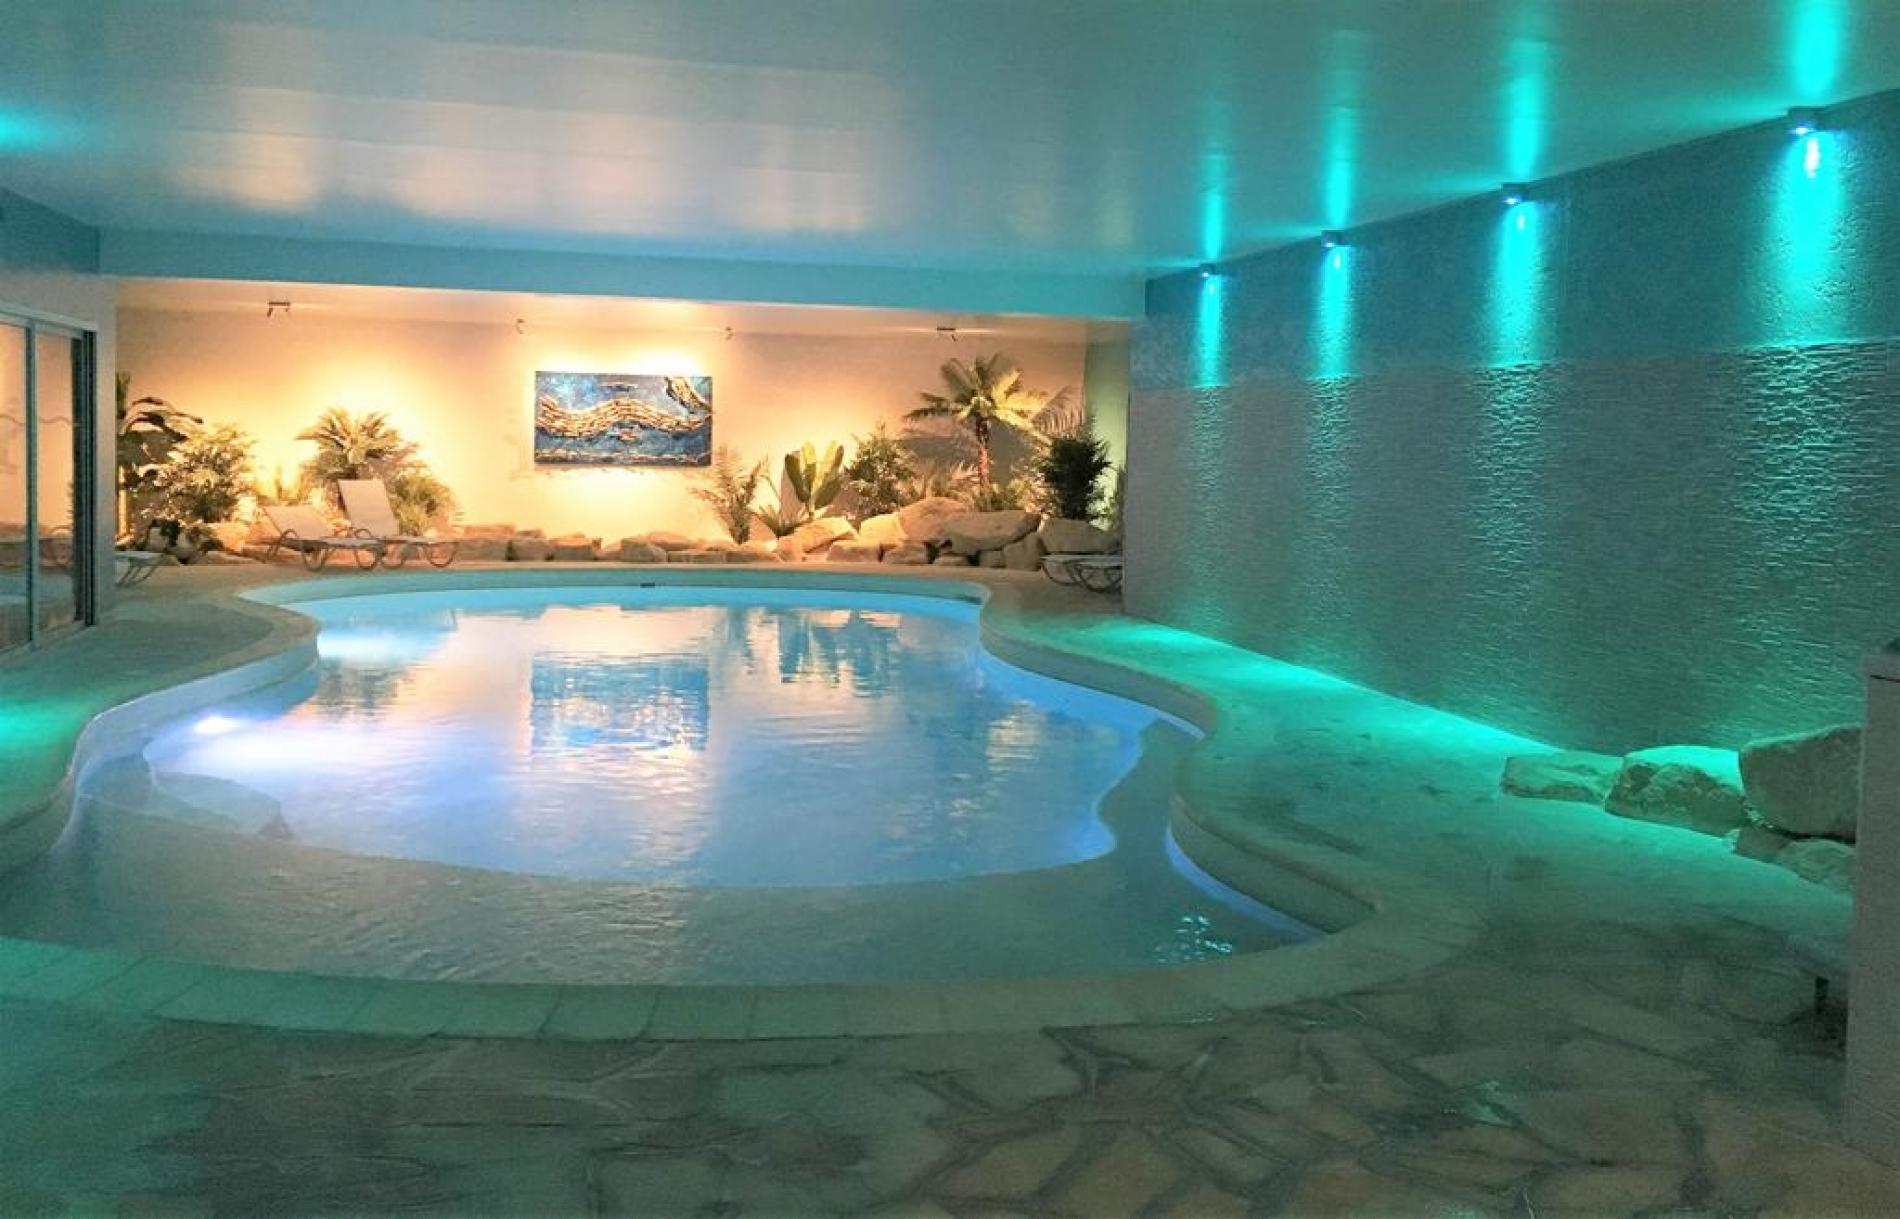 Piscines Es & Spas hotel deauville piscine spa of deauville